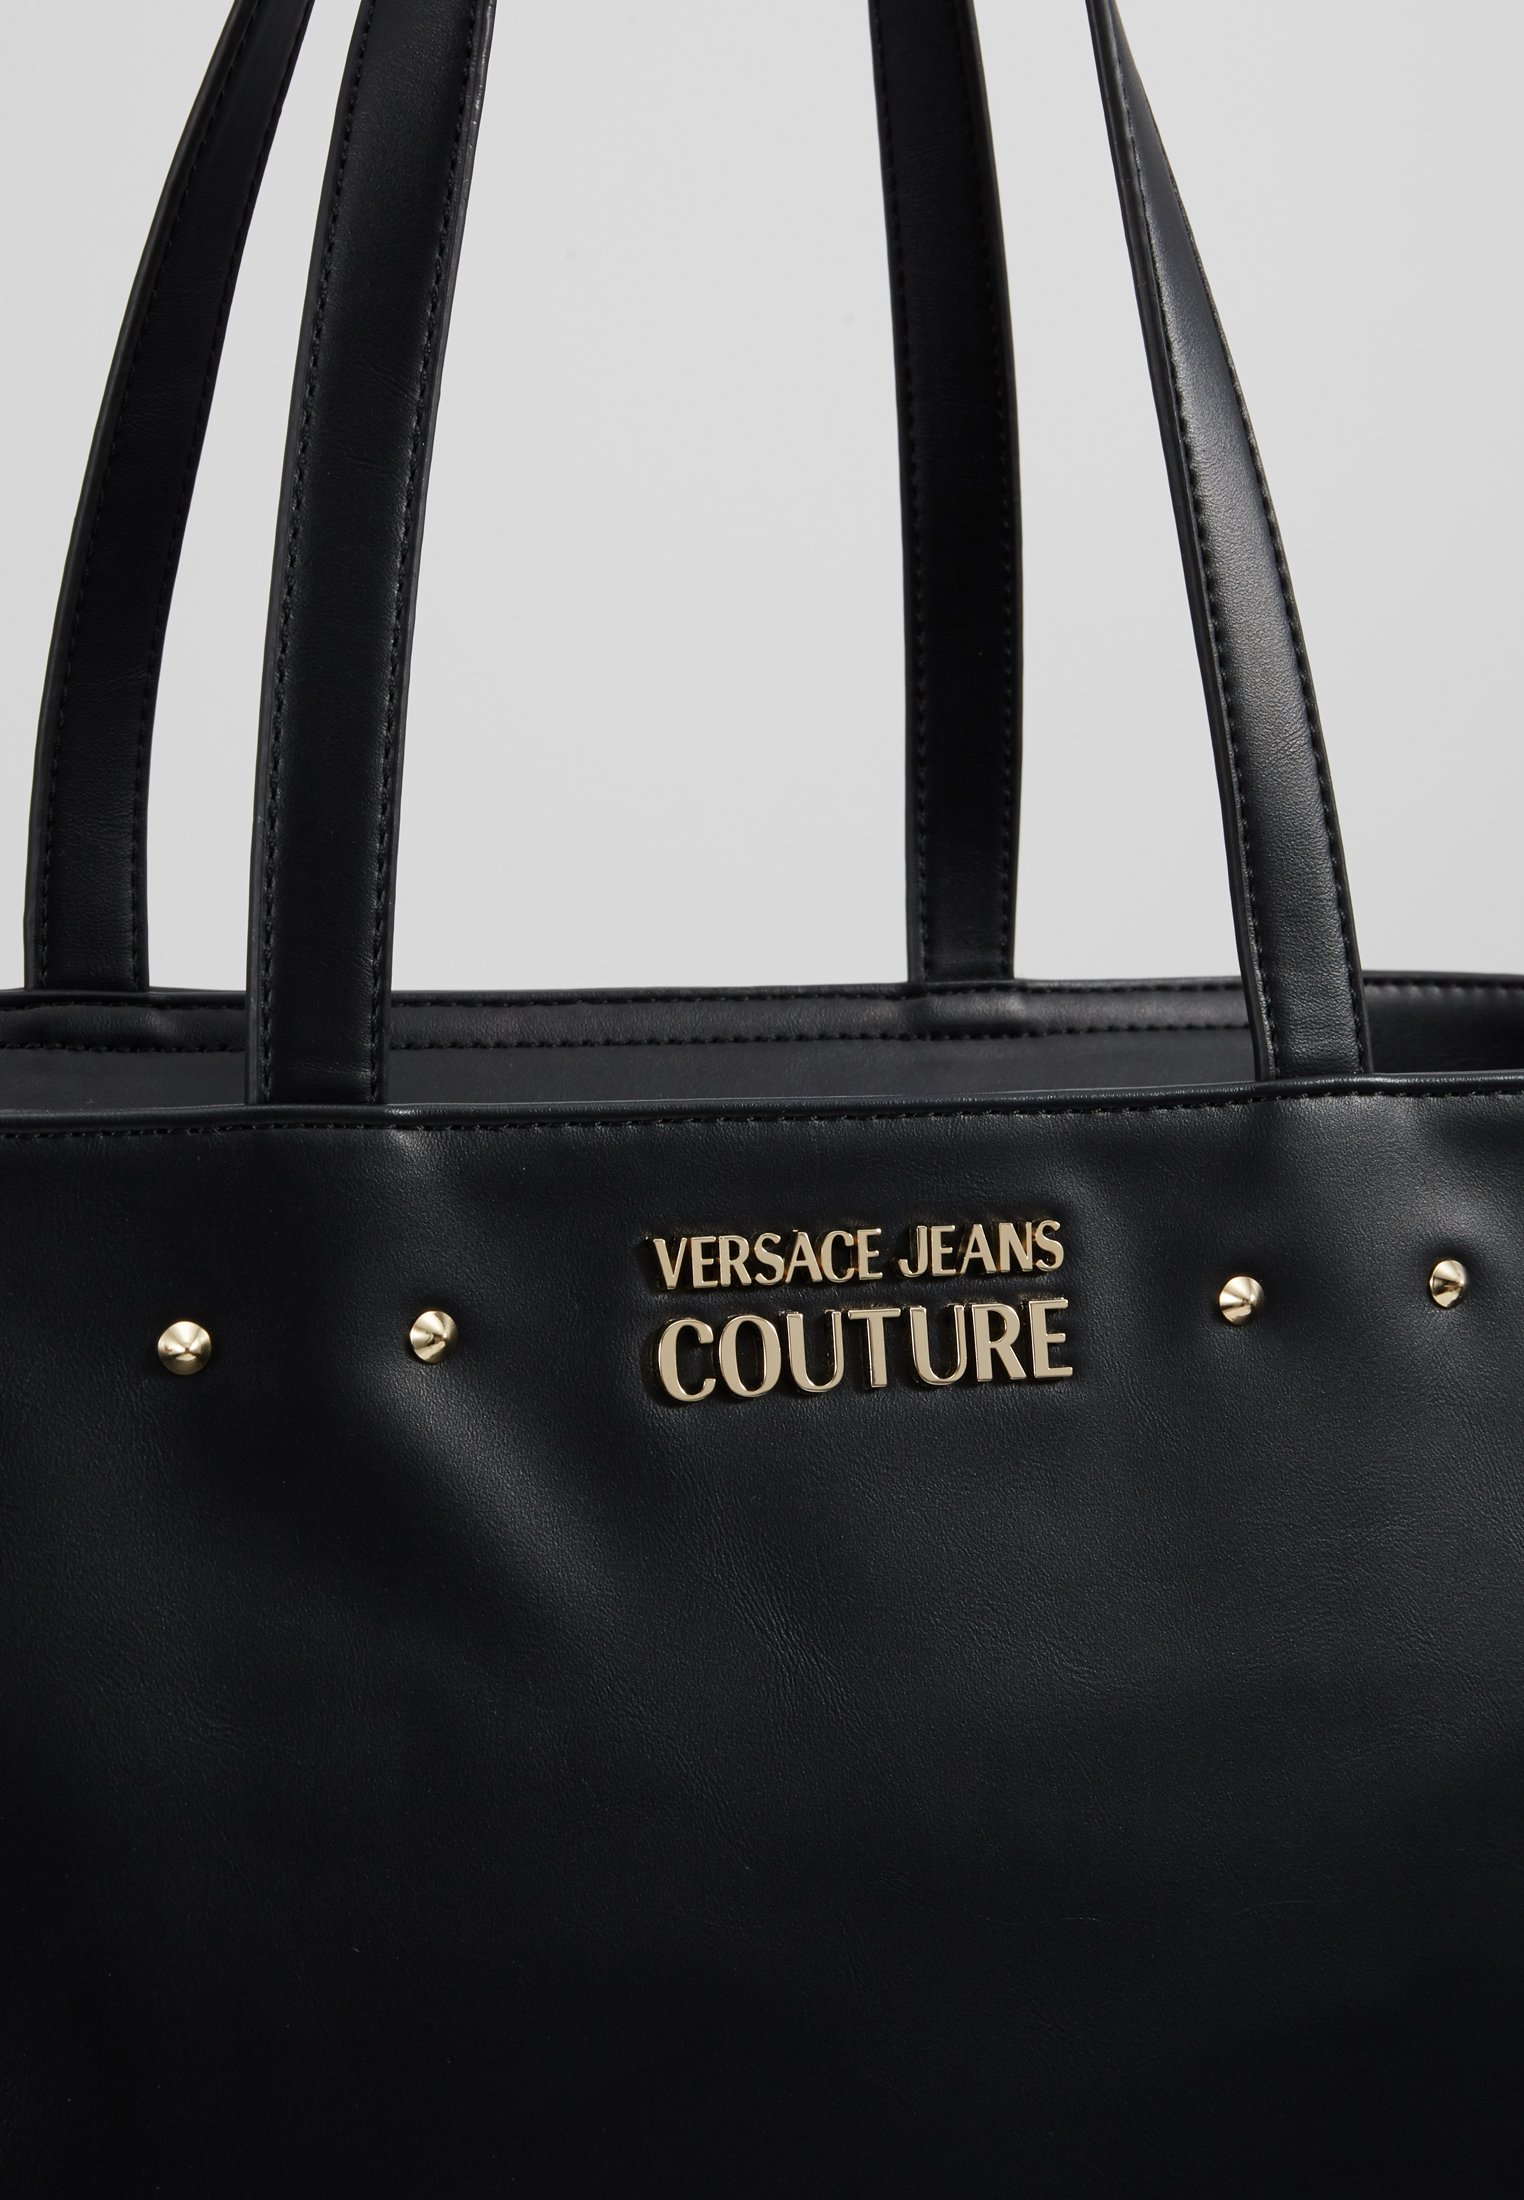 Versace Jeans Couture Handtasche - black - Black Friday